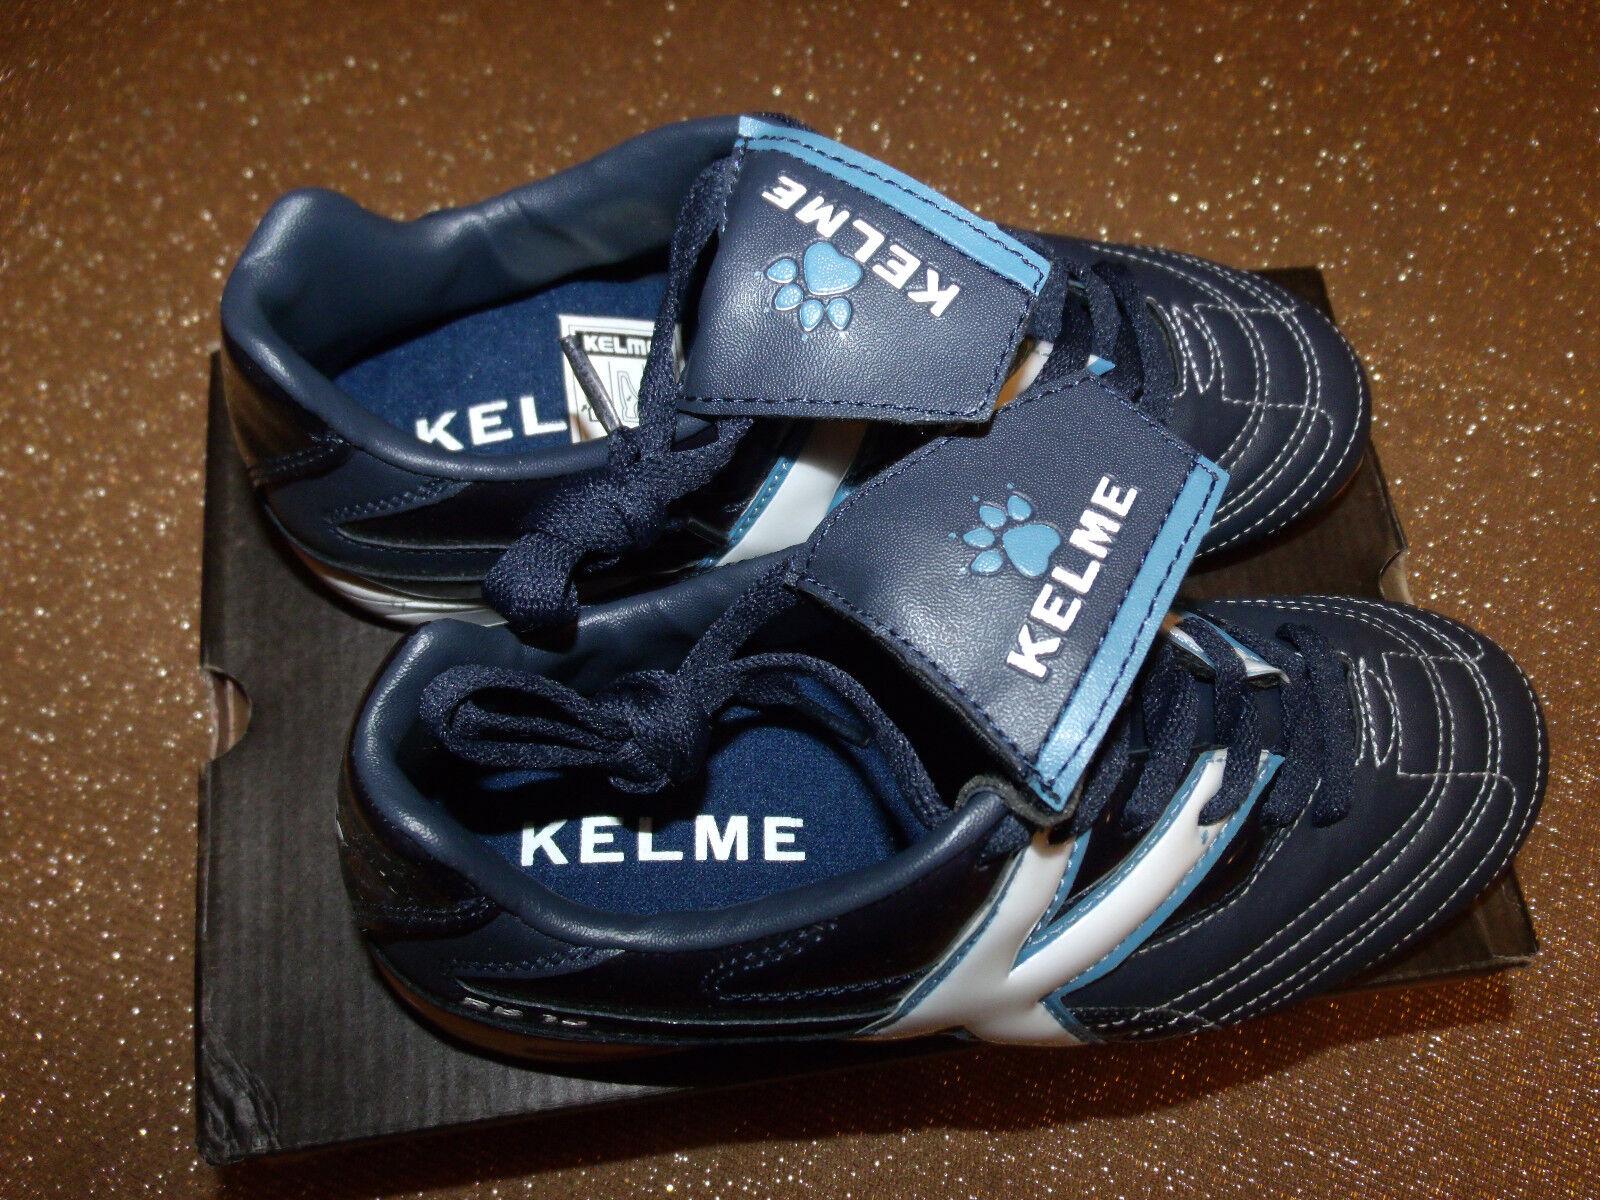 Nuovo YOUTH Soccer Cleats KELME 55611,  RB-15 T JUNIOR JUNIOR JUNIOR - Navy/Marino 107 Size 5.0 73b641